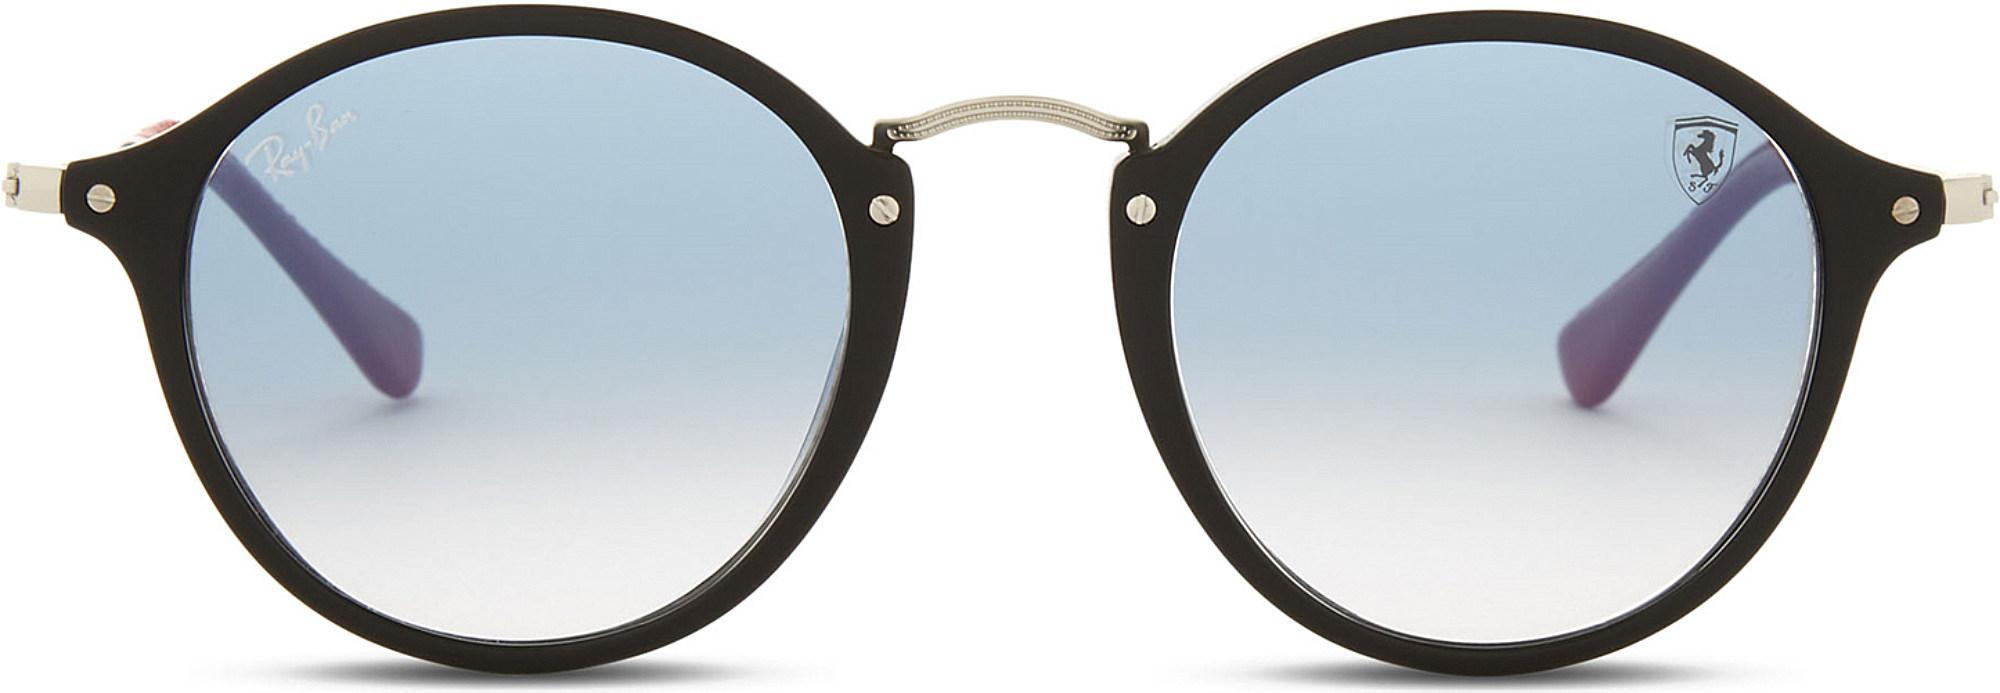 b36c8a04eec Ray-Ban Scuderia Ferrari Rb2447nm Round-frame Sunglasses in Black - Lyst